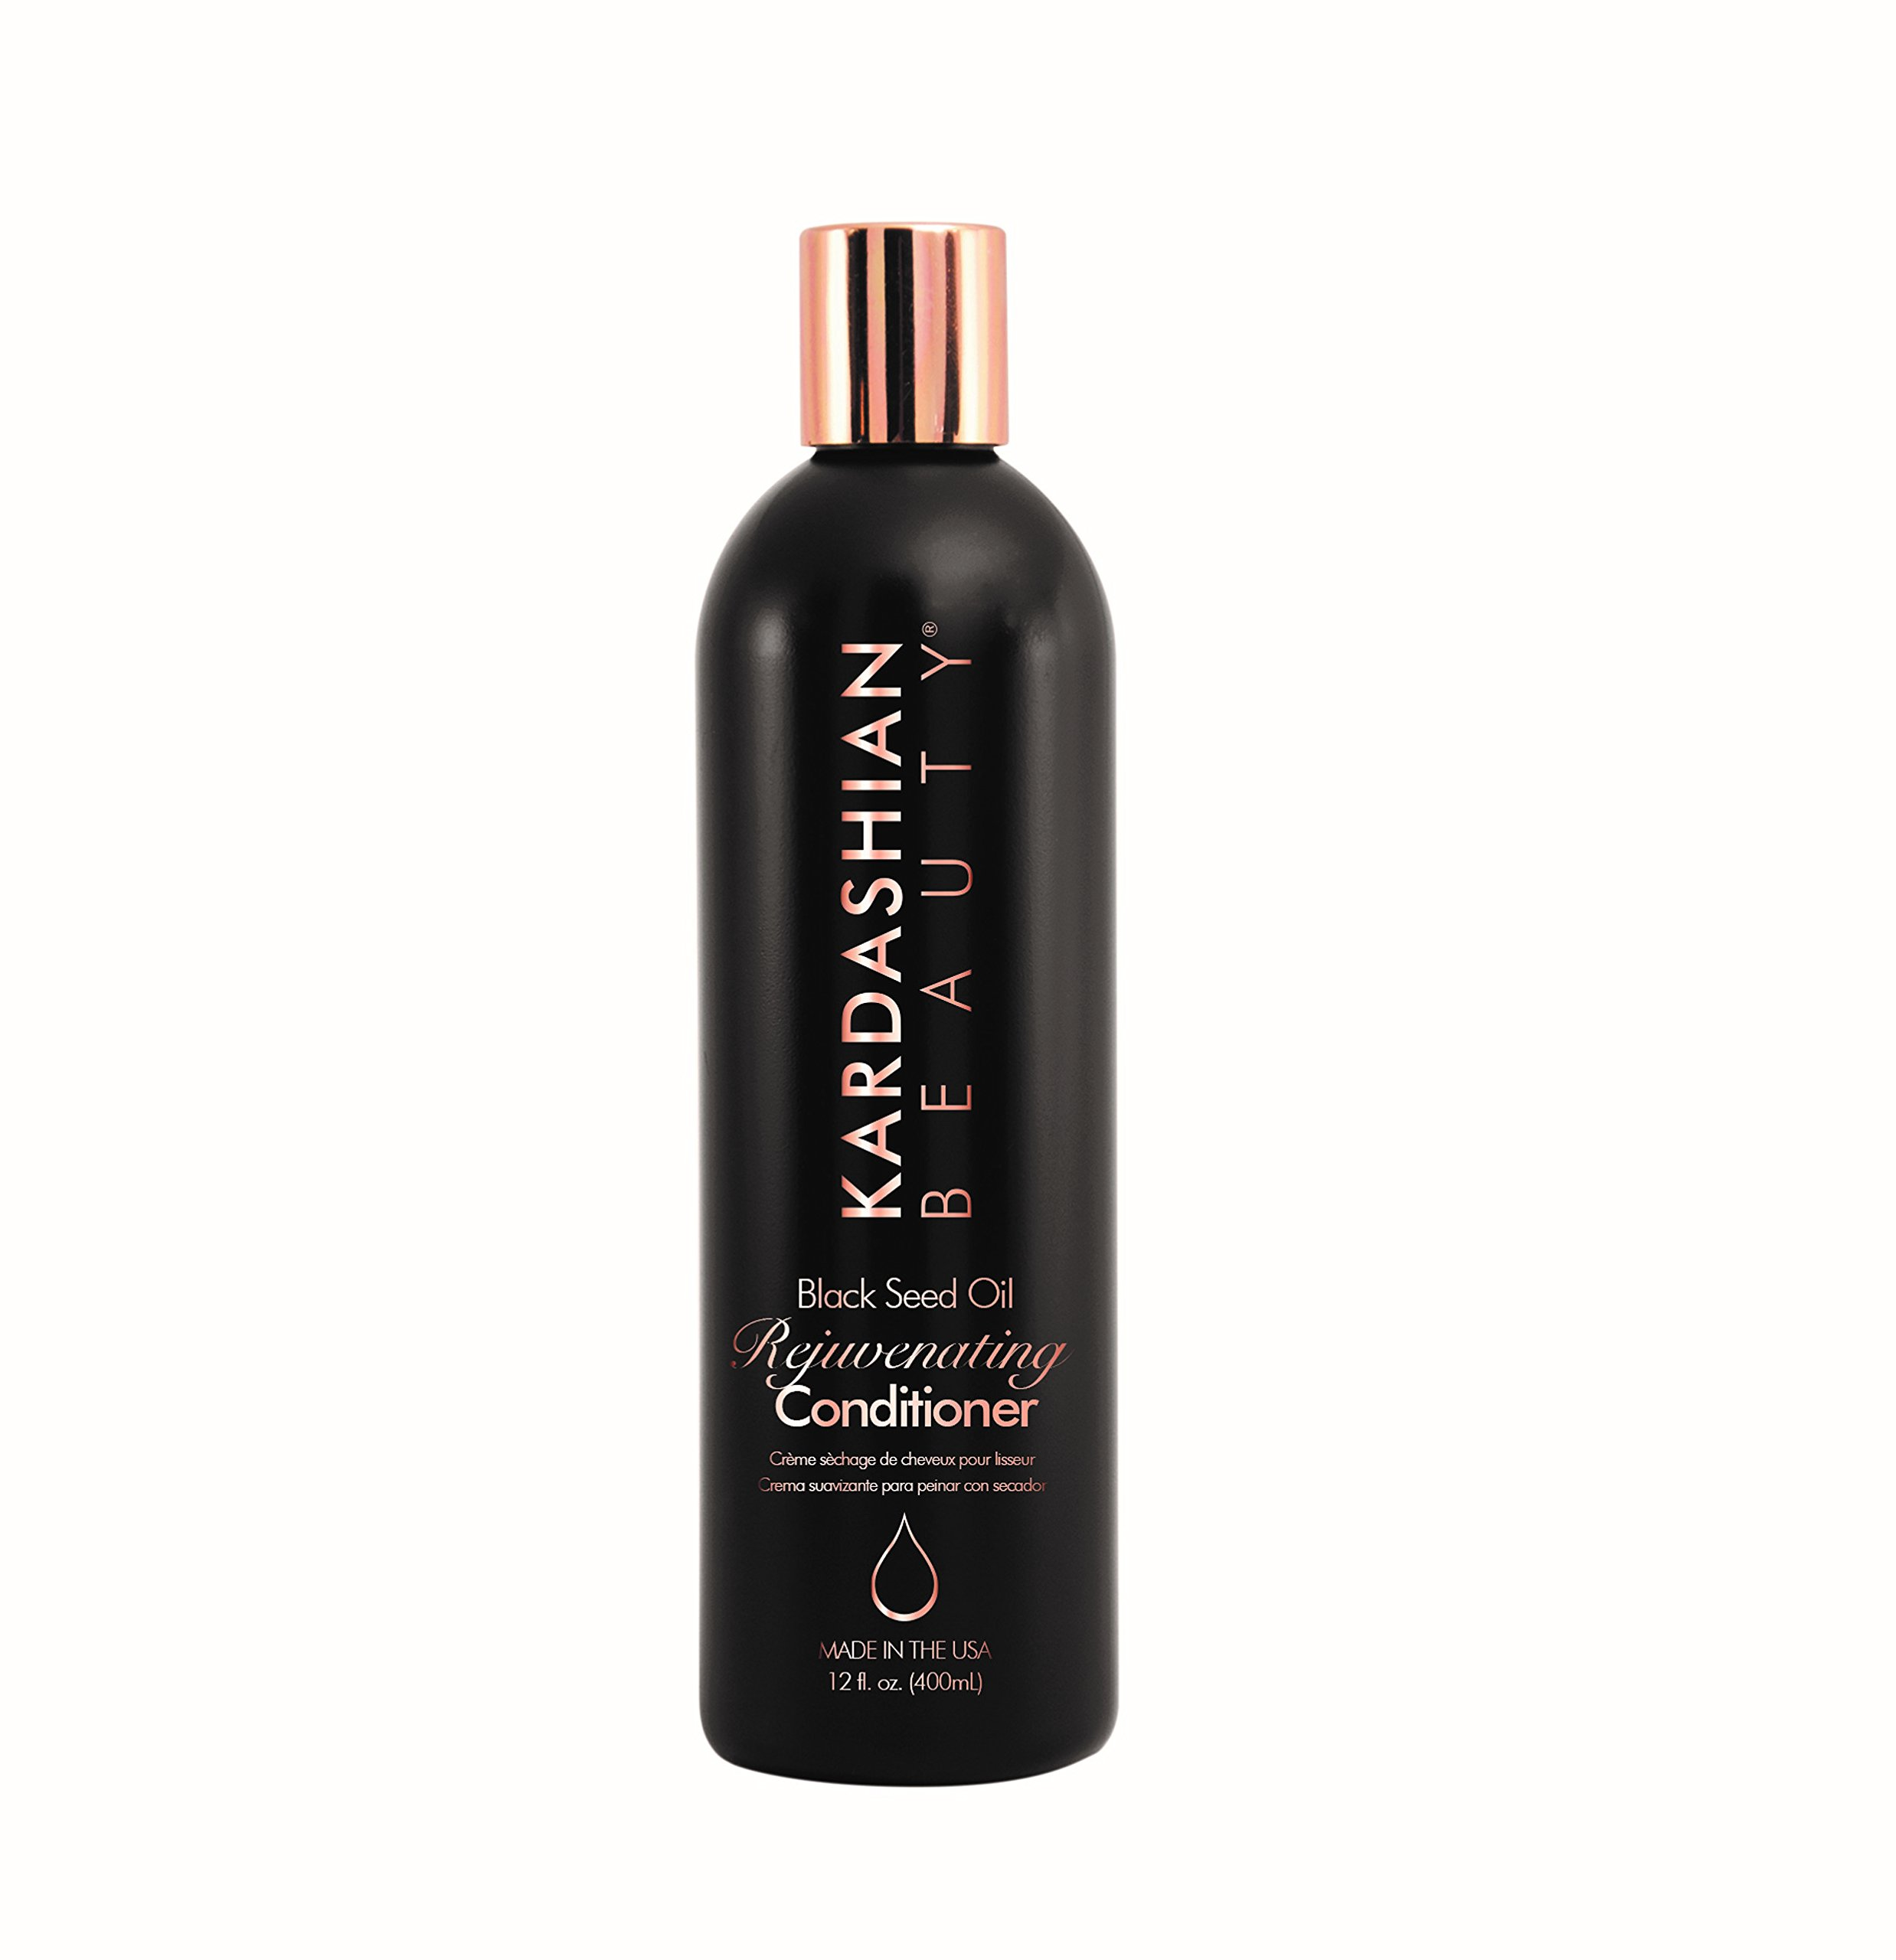 Amazon.com : Kardashian Beauty Black Seed Oil Rejuvenating Conditoner 12 ounce : Beauty